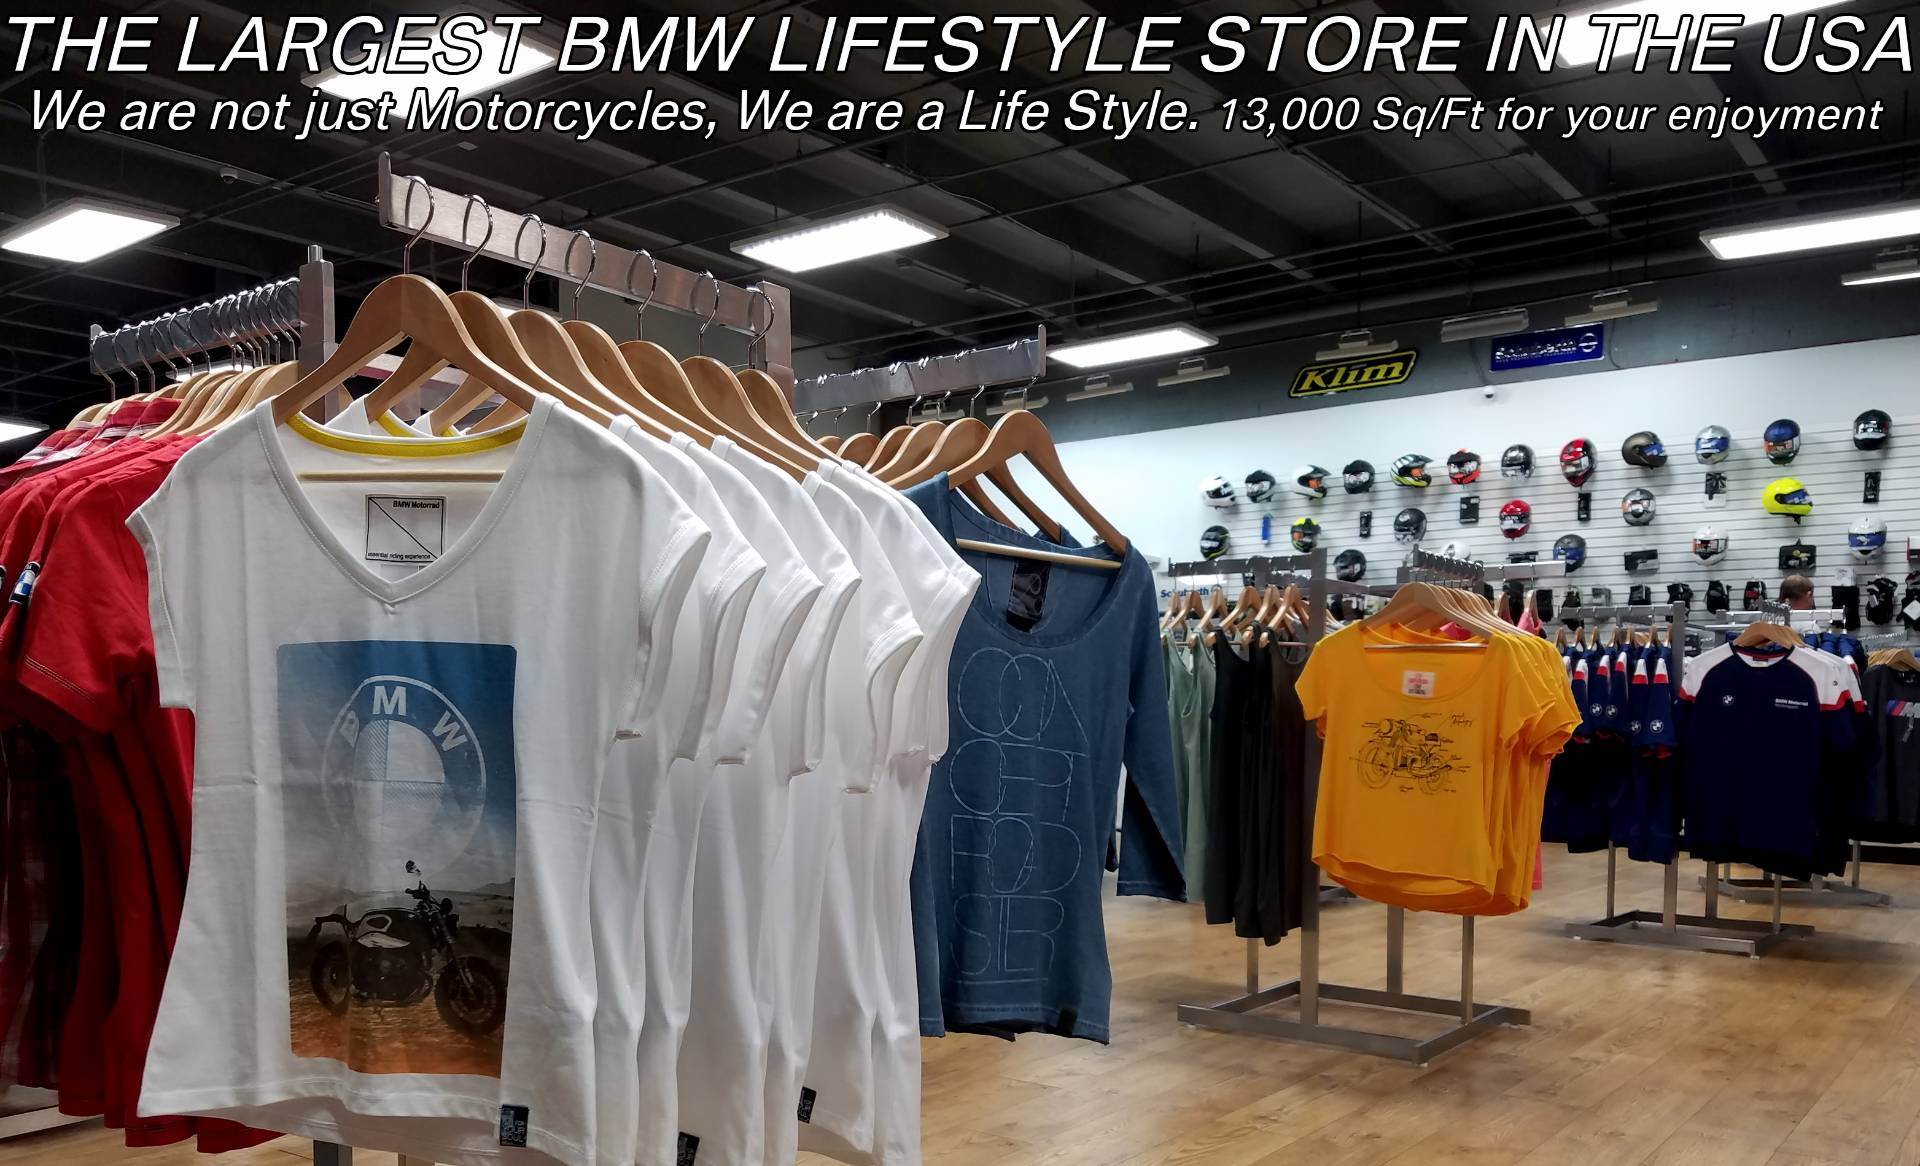 2018 bmw g310r. wonderful 2018 new 2018 bmw g 310 r for sale white and black with bmw g310r